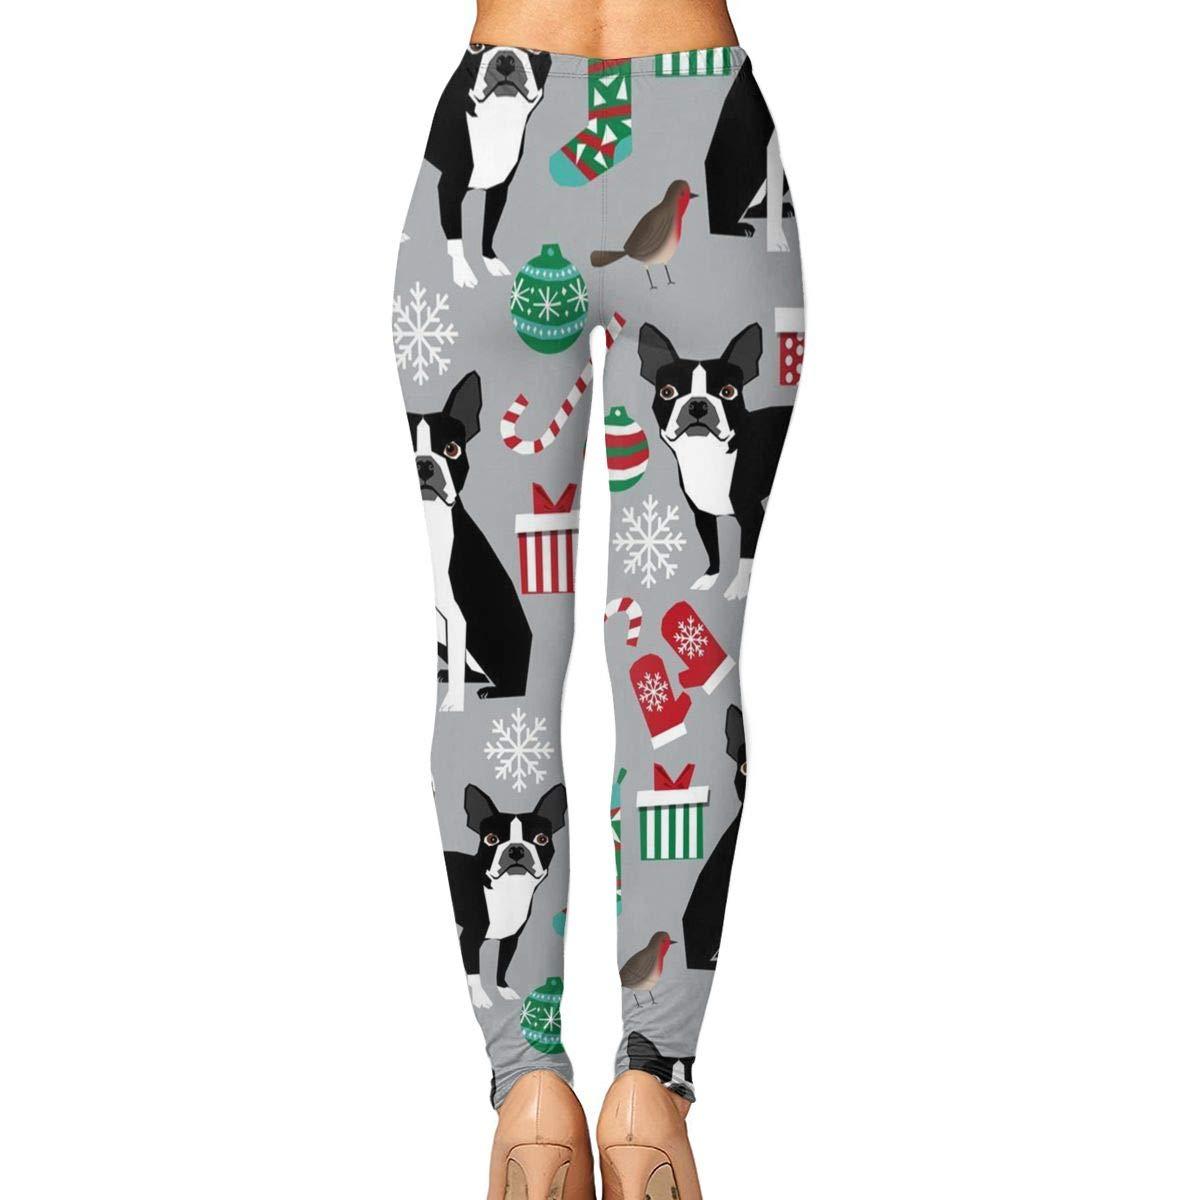 c135415df3bdf5 Amazon.com : Xayeu Cute Boston Terrier Christmas Yoga Pants for Women Sport  Tights Workout Running Leggings : Sports & Outdoors